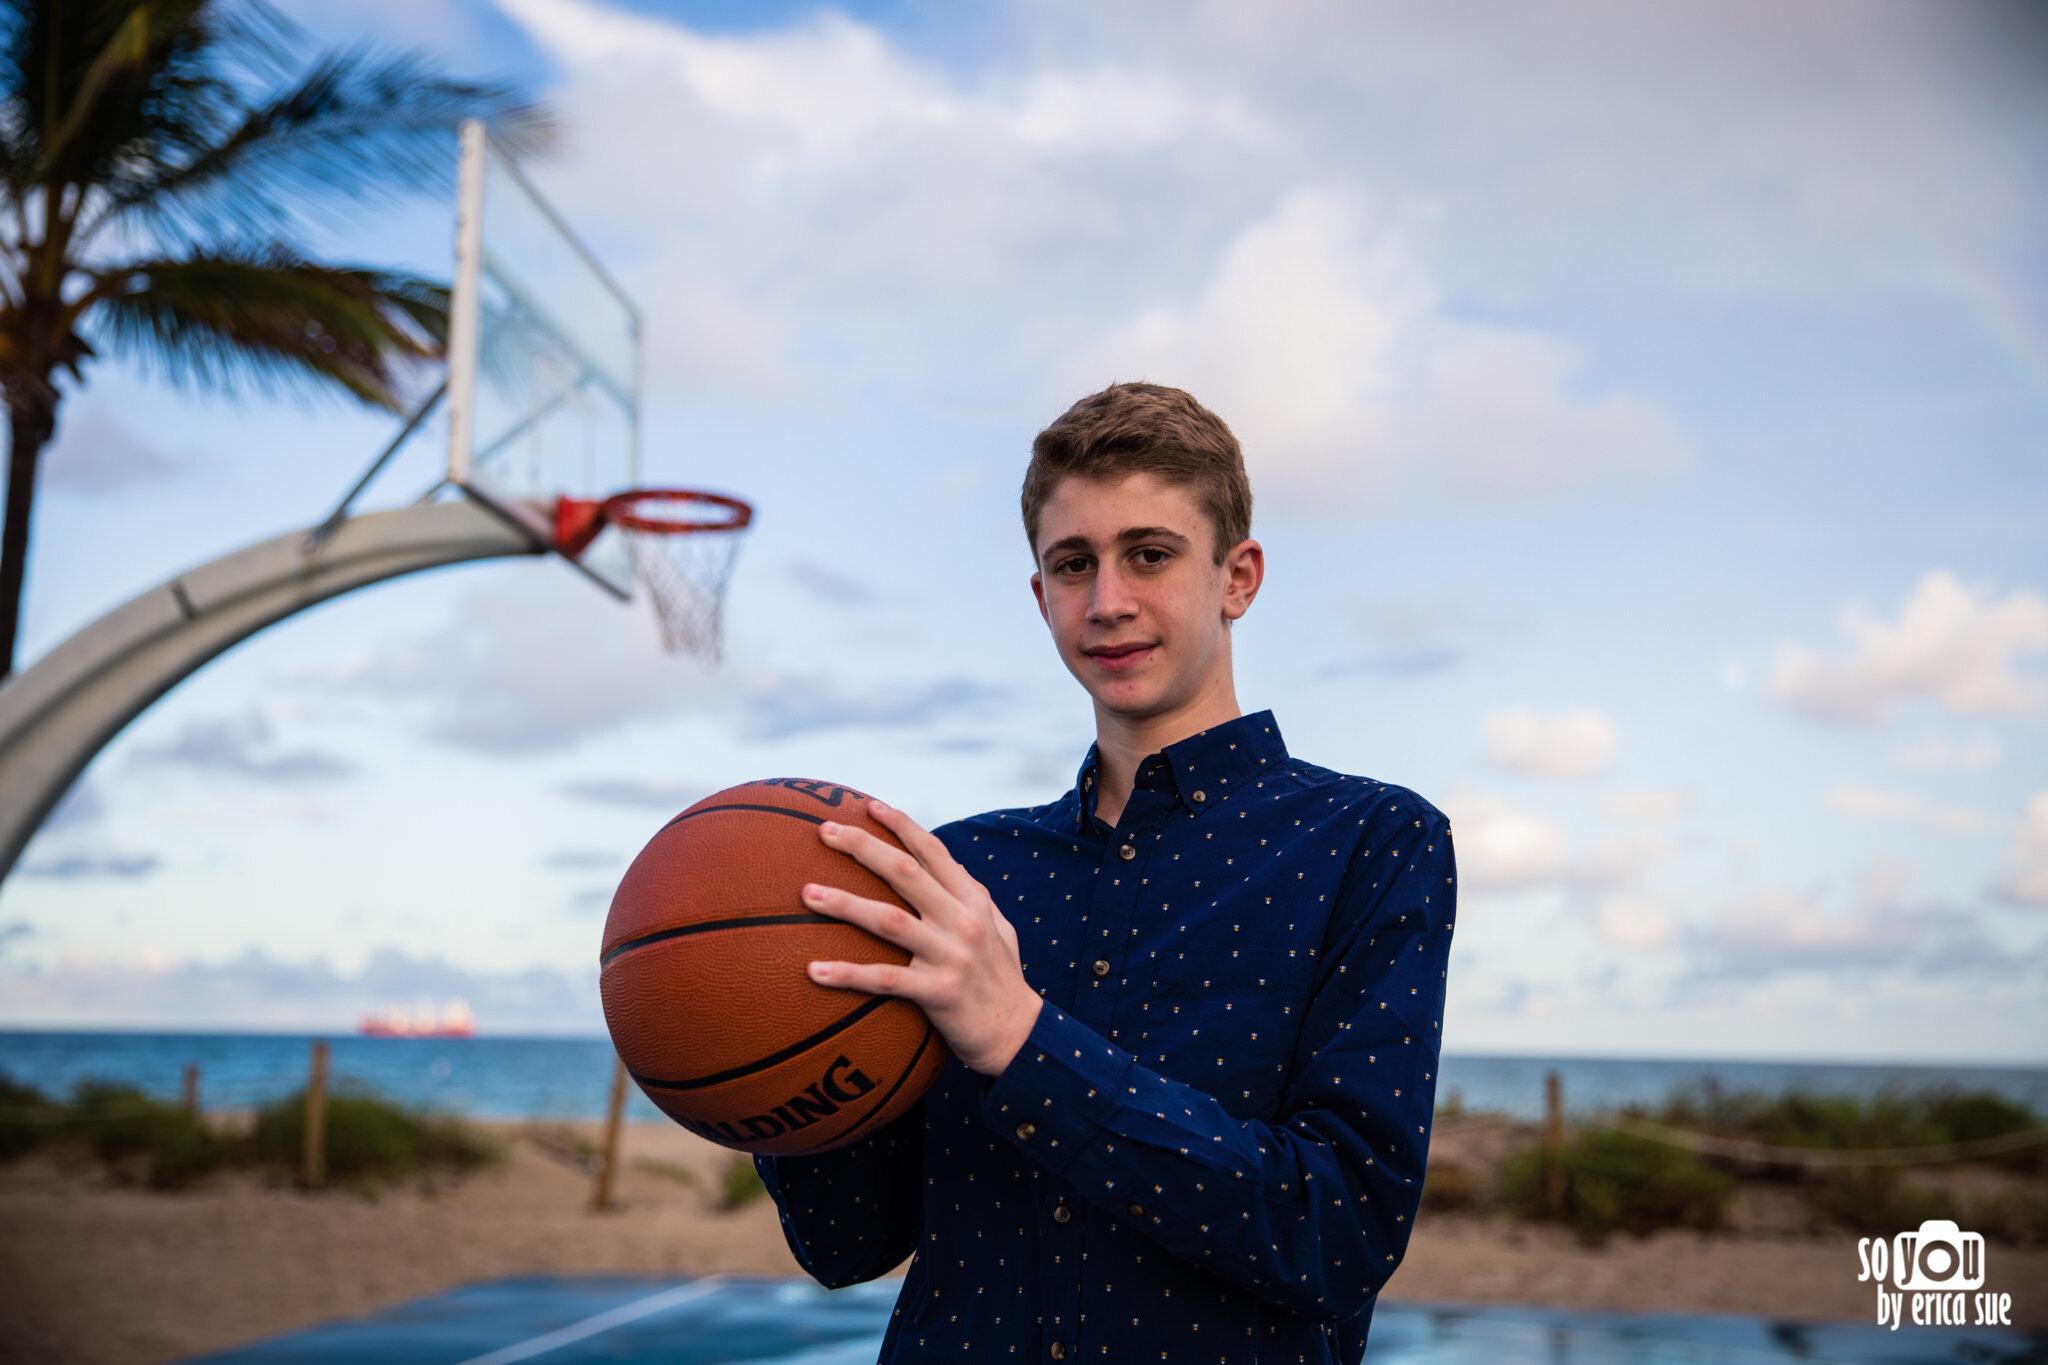 so-you-by-erica-sue-ft-lauderdale-beach-basketball-mitzvah-pre-shoot-9467.JPG